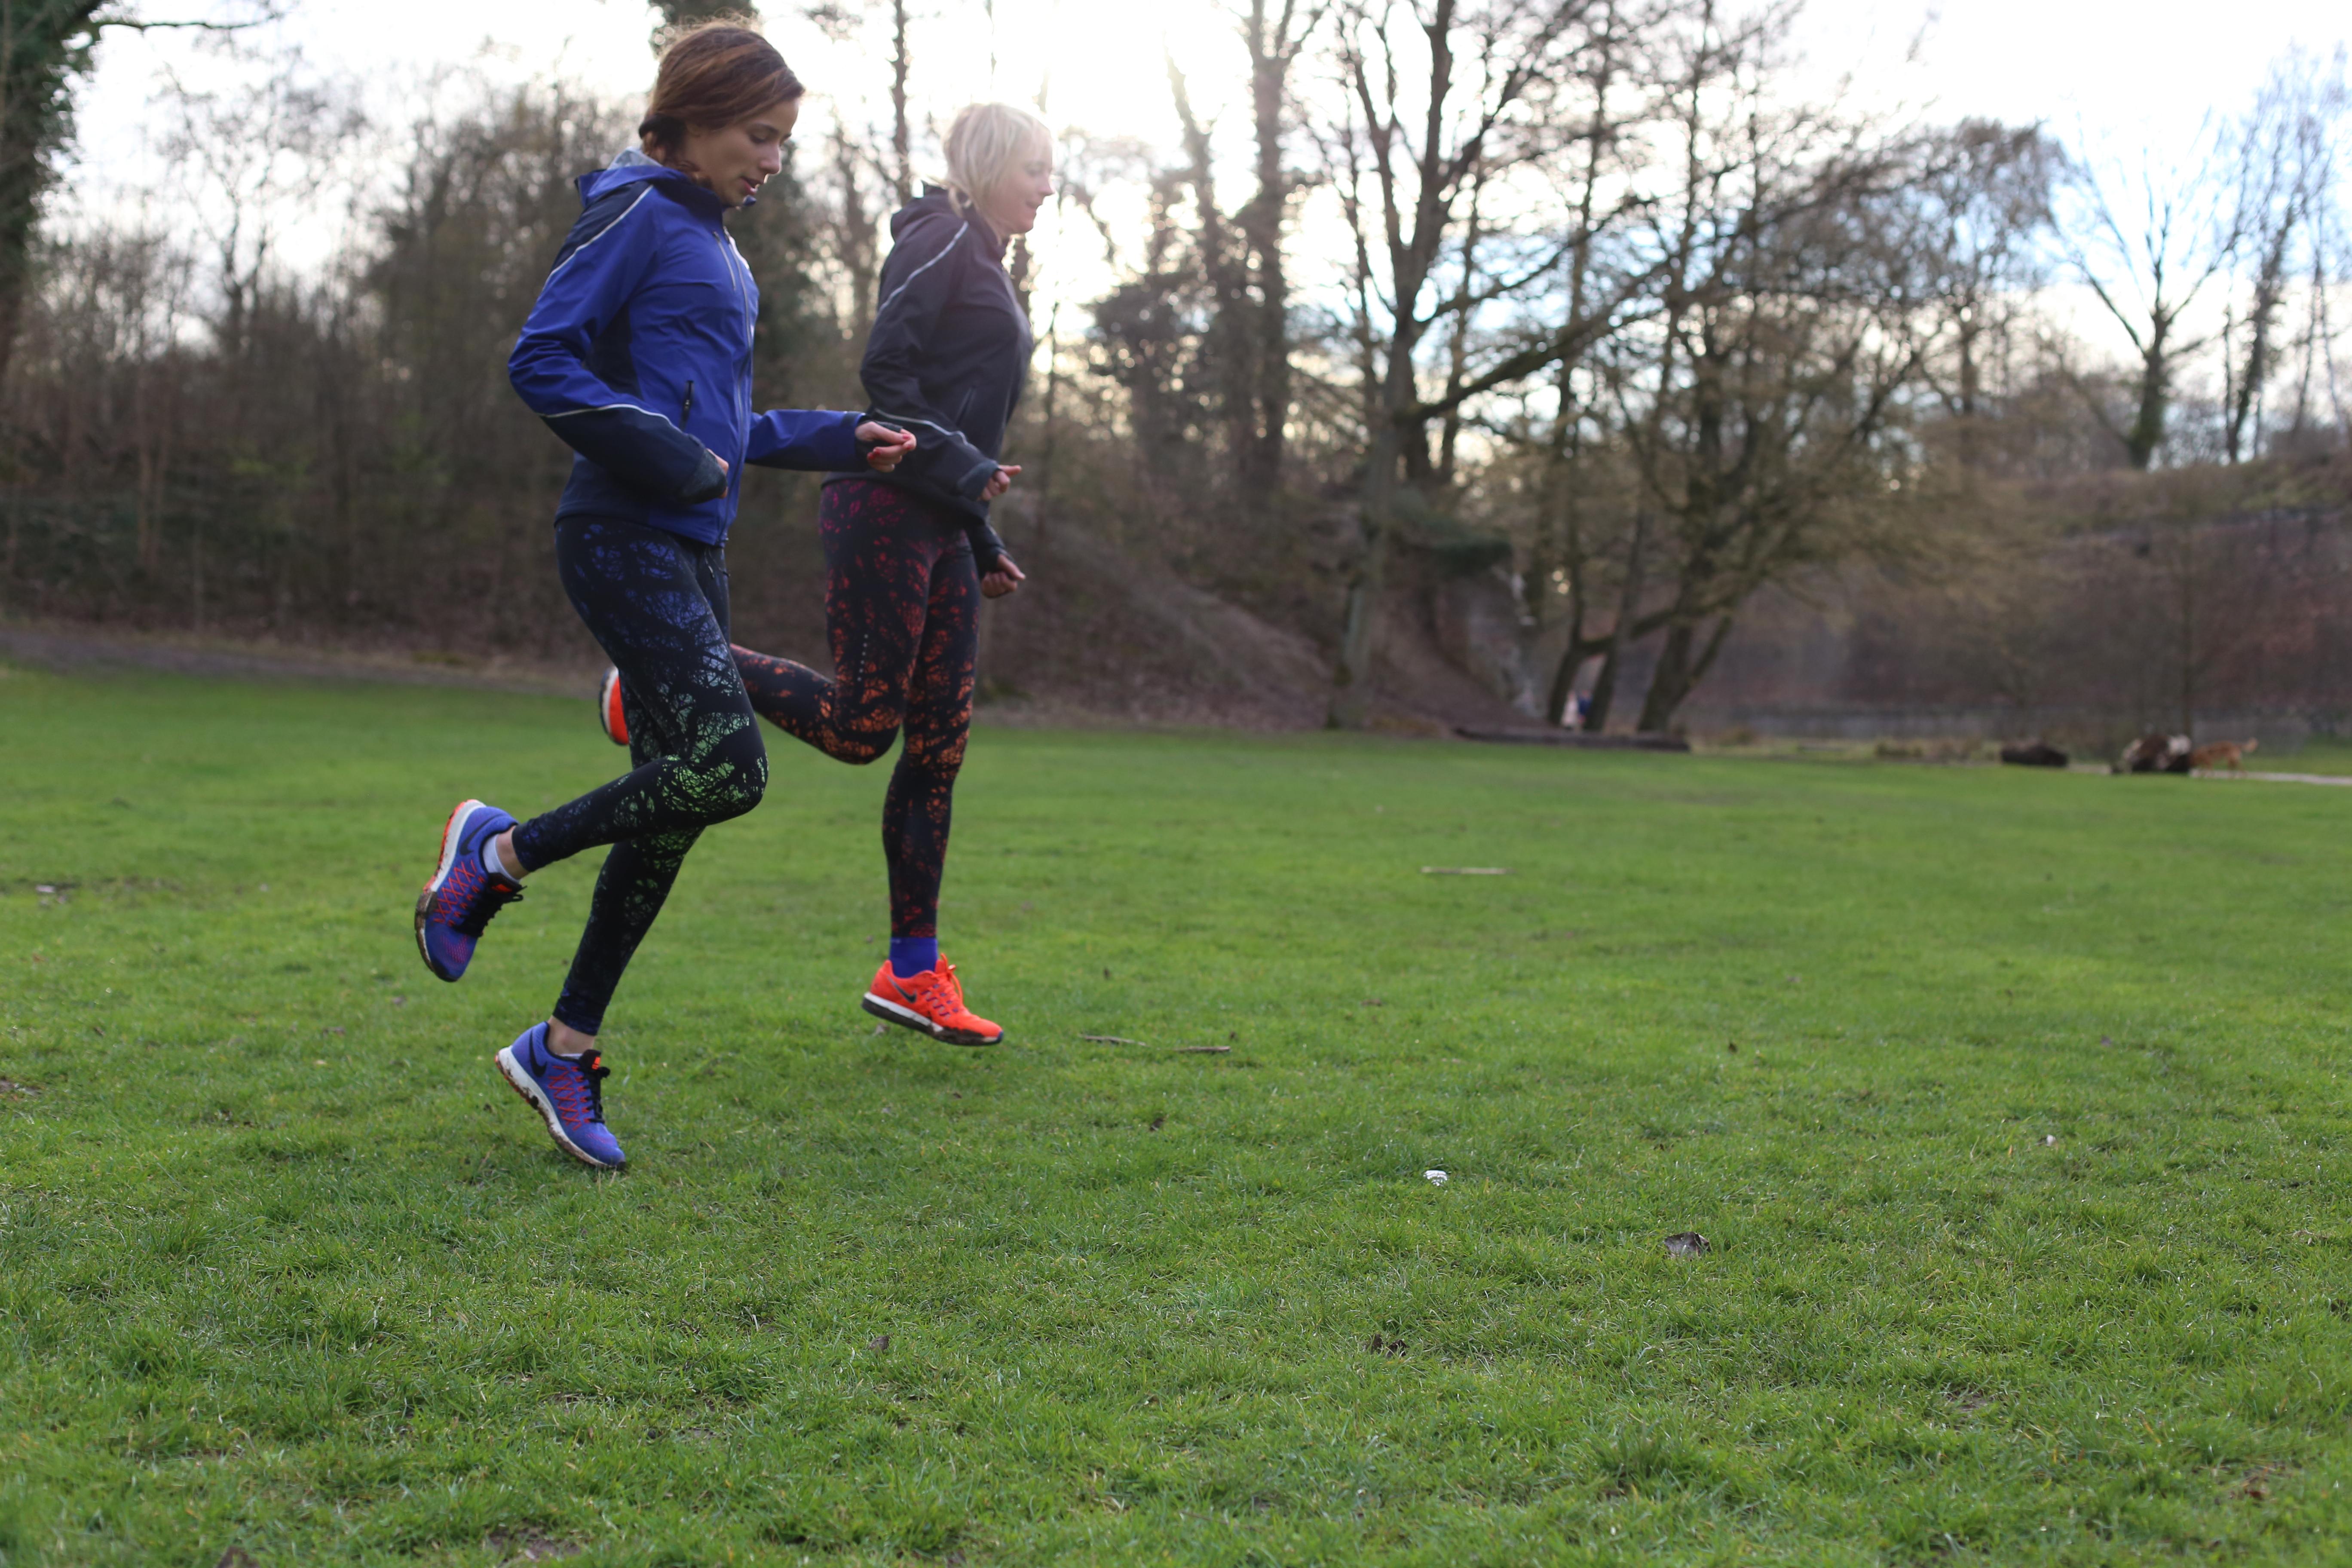 nouveau concept 843cd 6e280 Running Tenue Femme Nike Veste et Legging (13) - Santa Mila